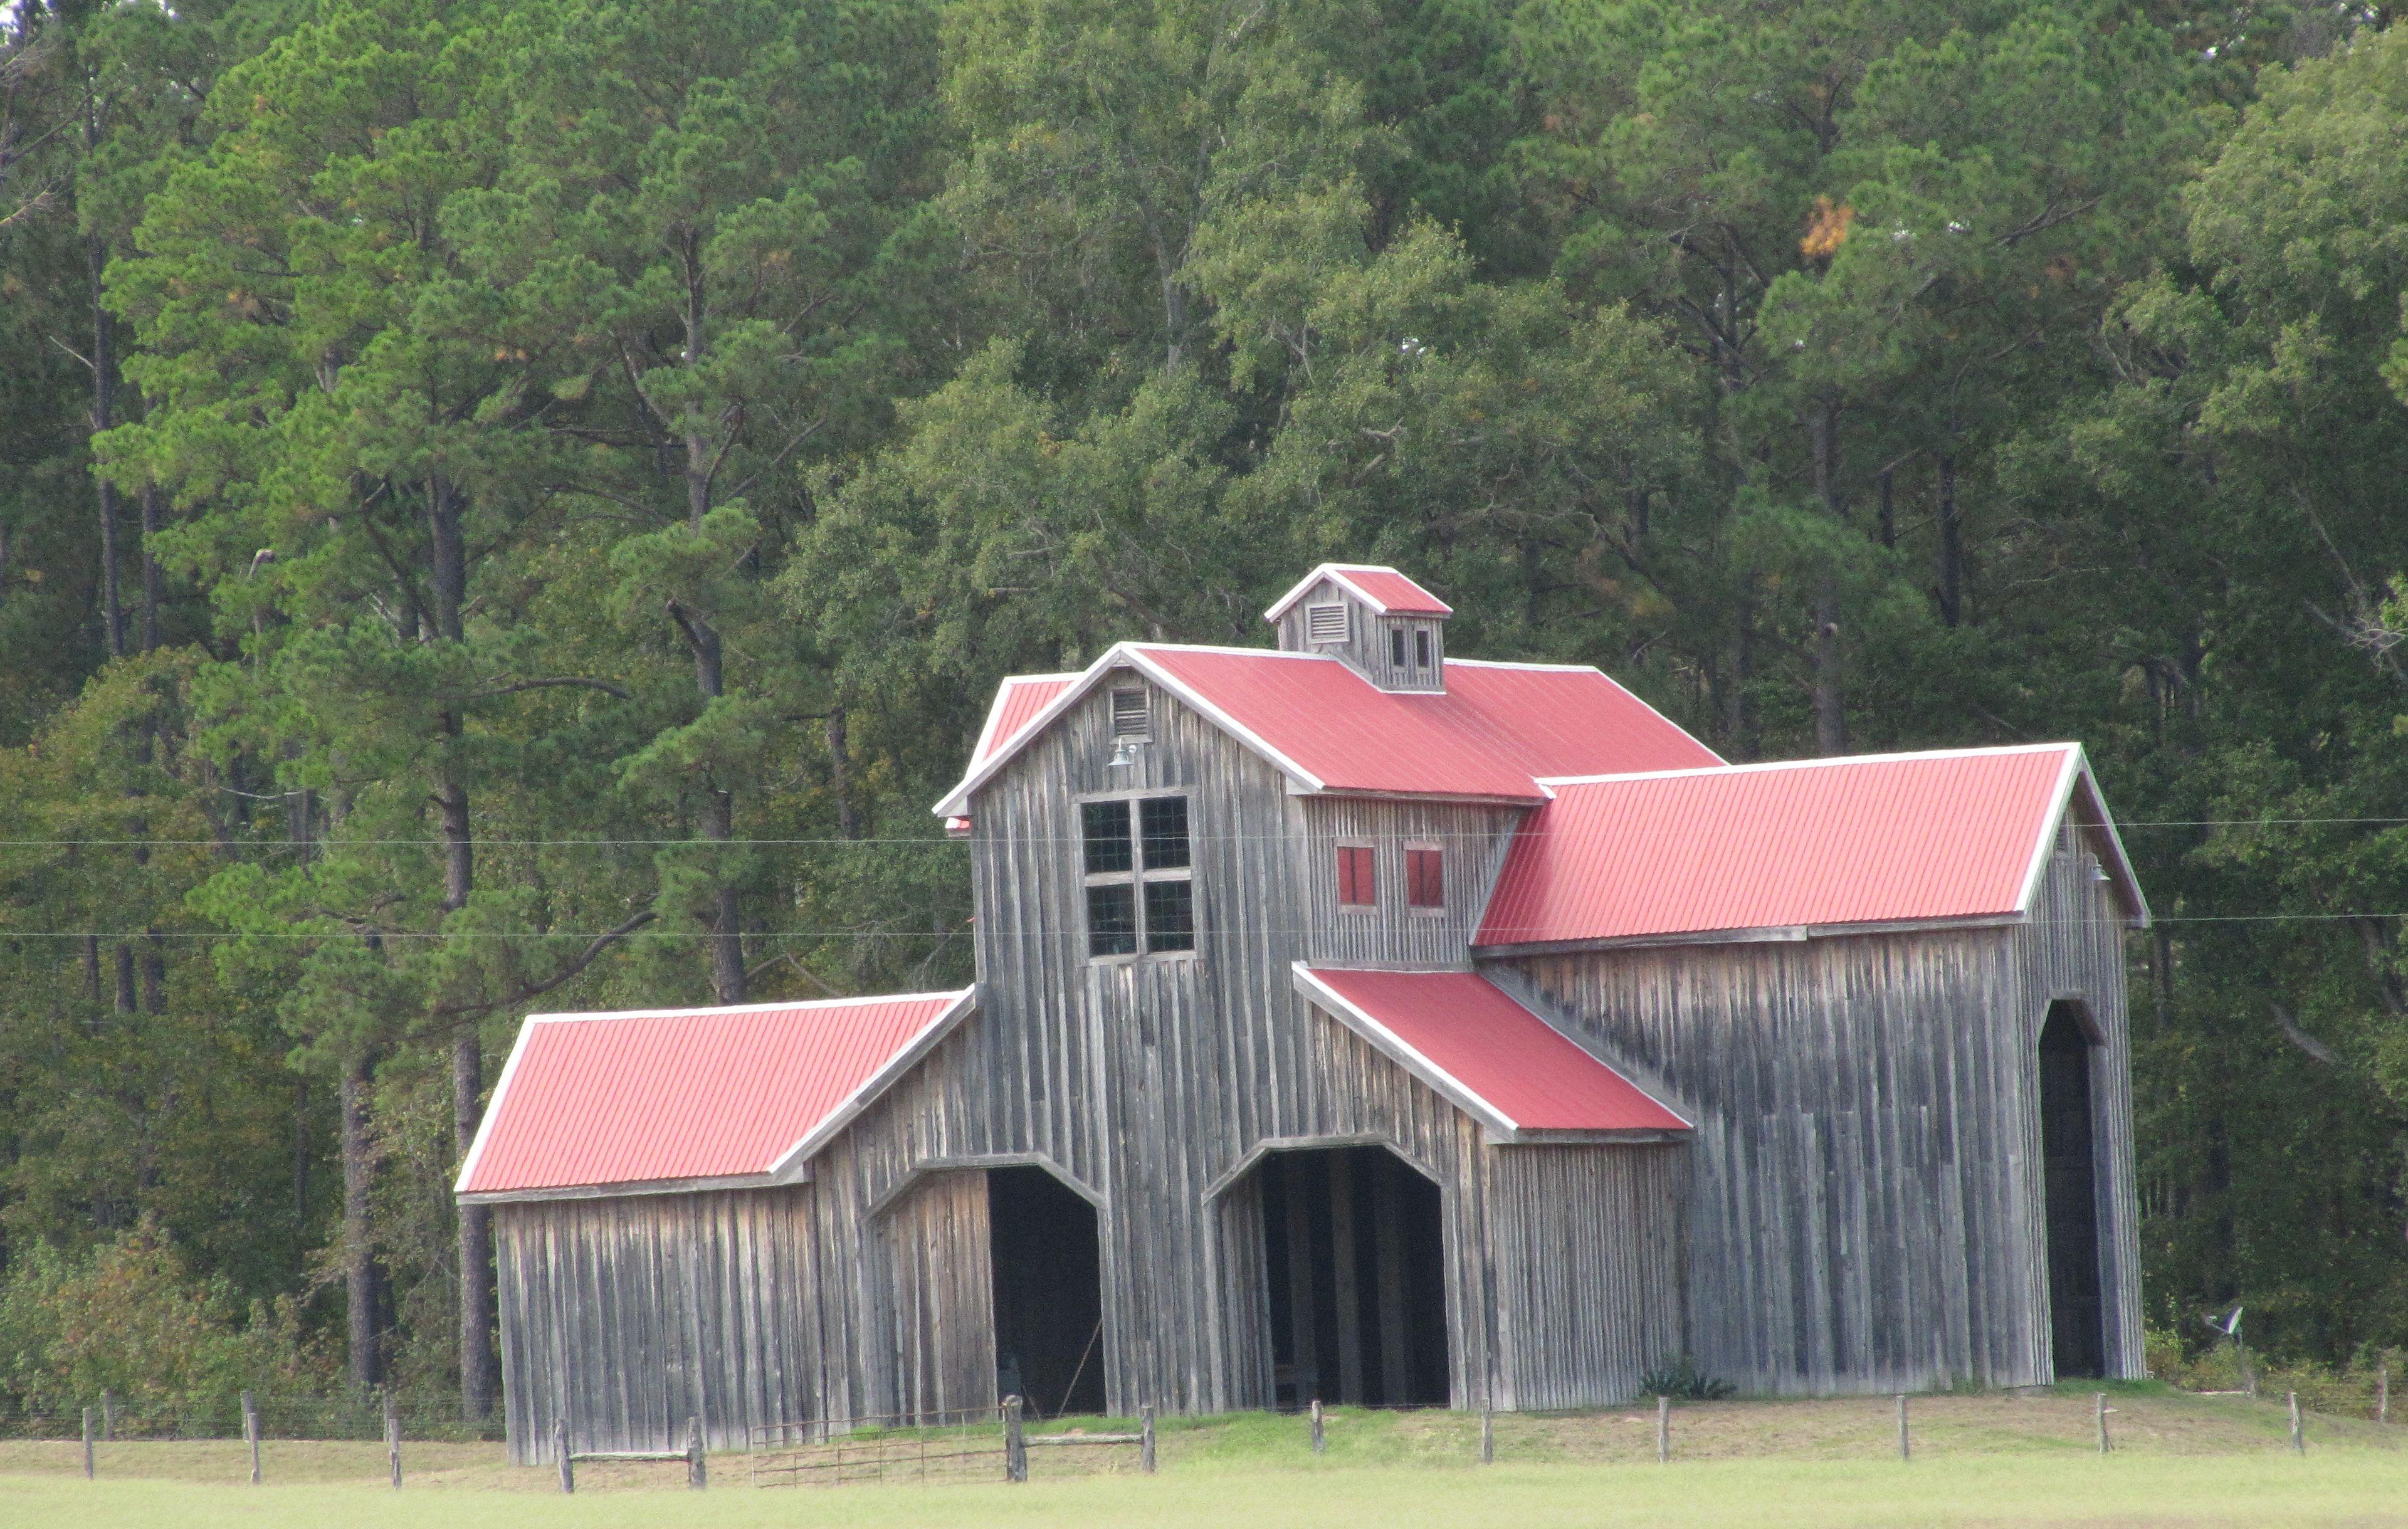 East texas barn i wonder where in east texas texas old for Barn houses in texas